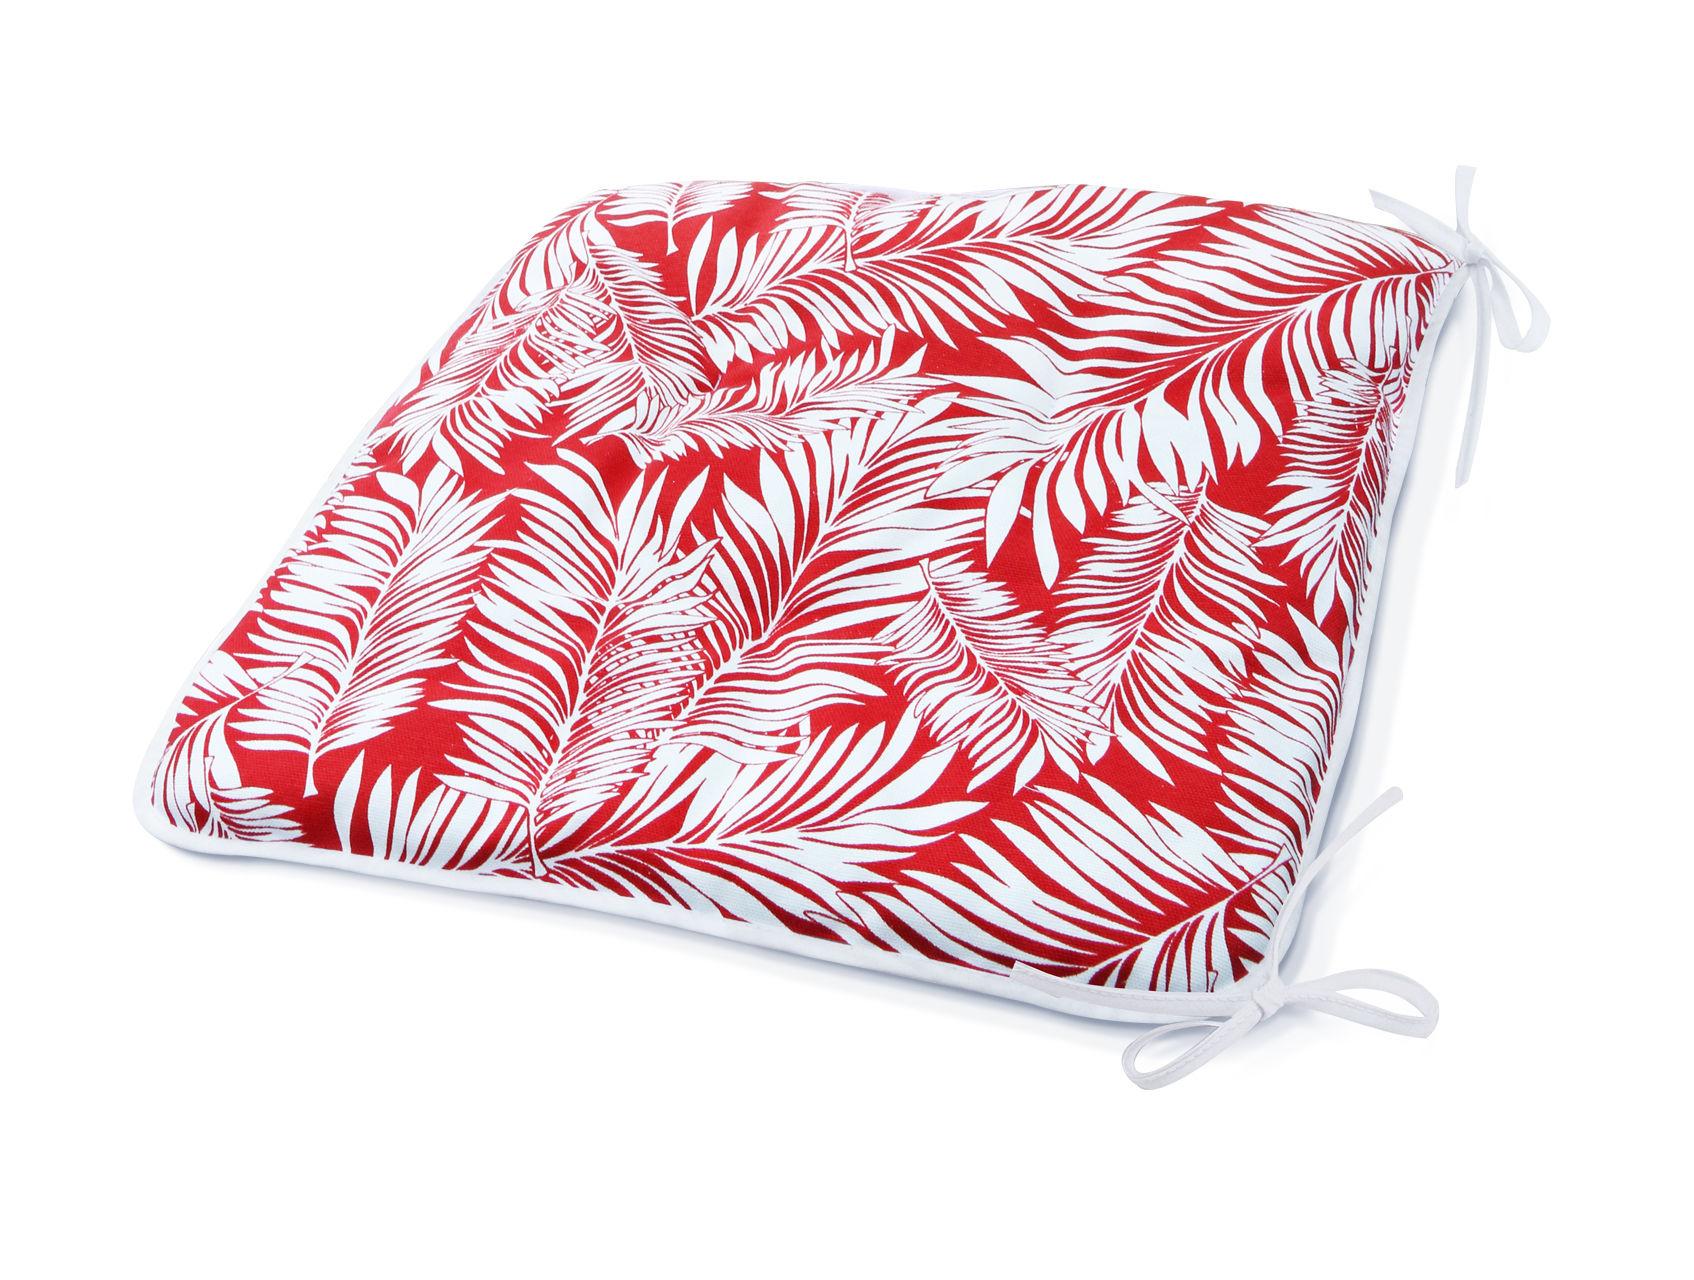 Подушки на стул Kauffort Подушка на стул Palma Цвет: Красный (40х40) kauffort подушка на стул нosta цвет бордово фиолетовый 40х40